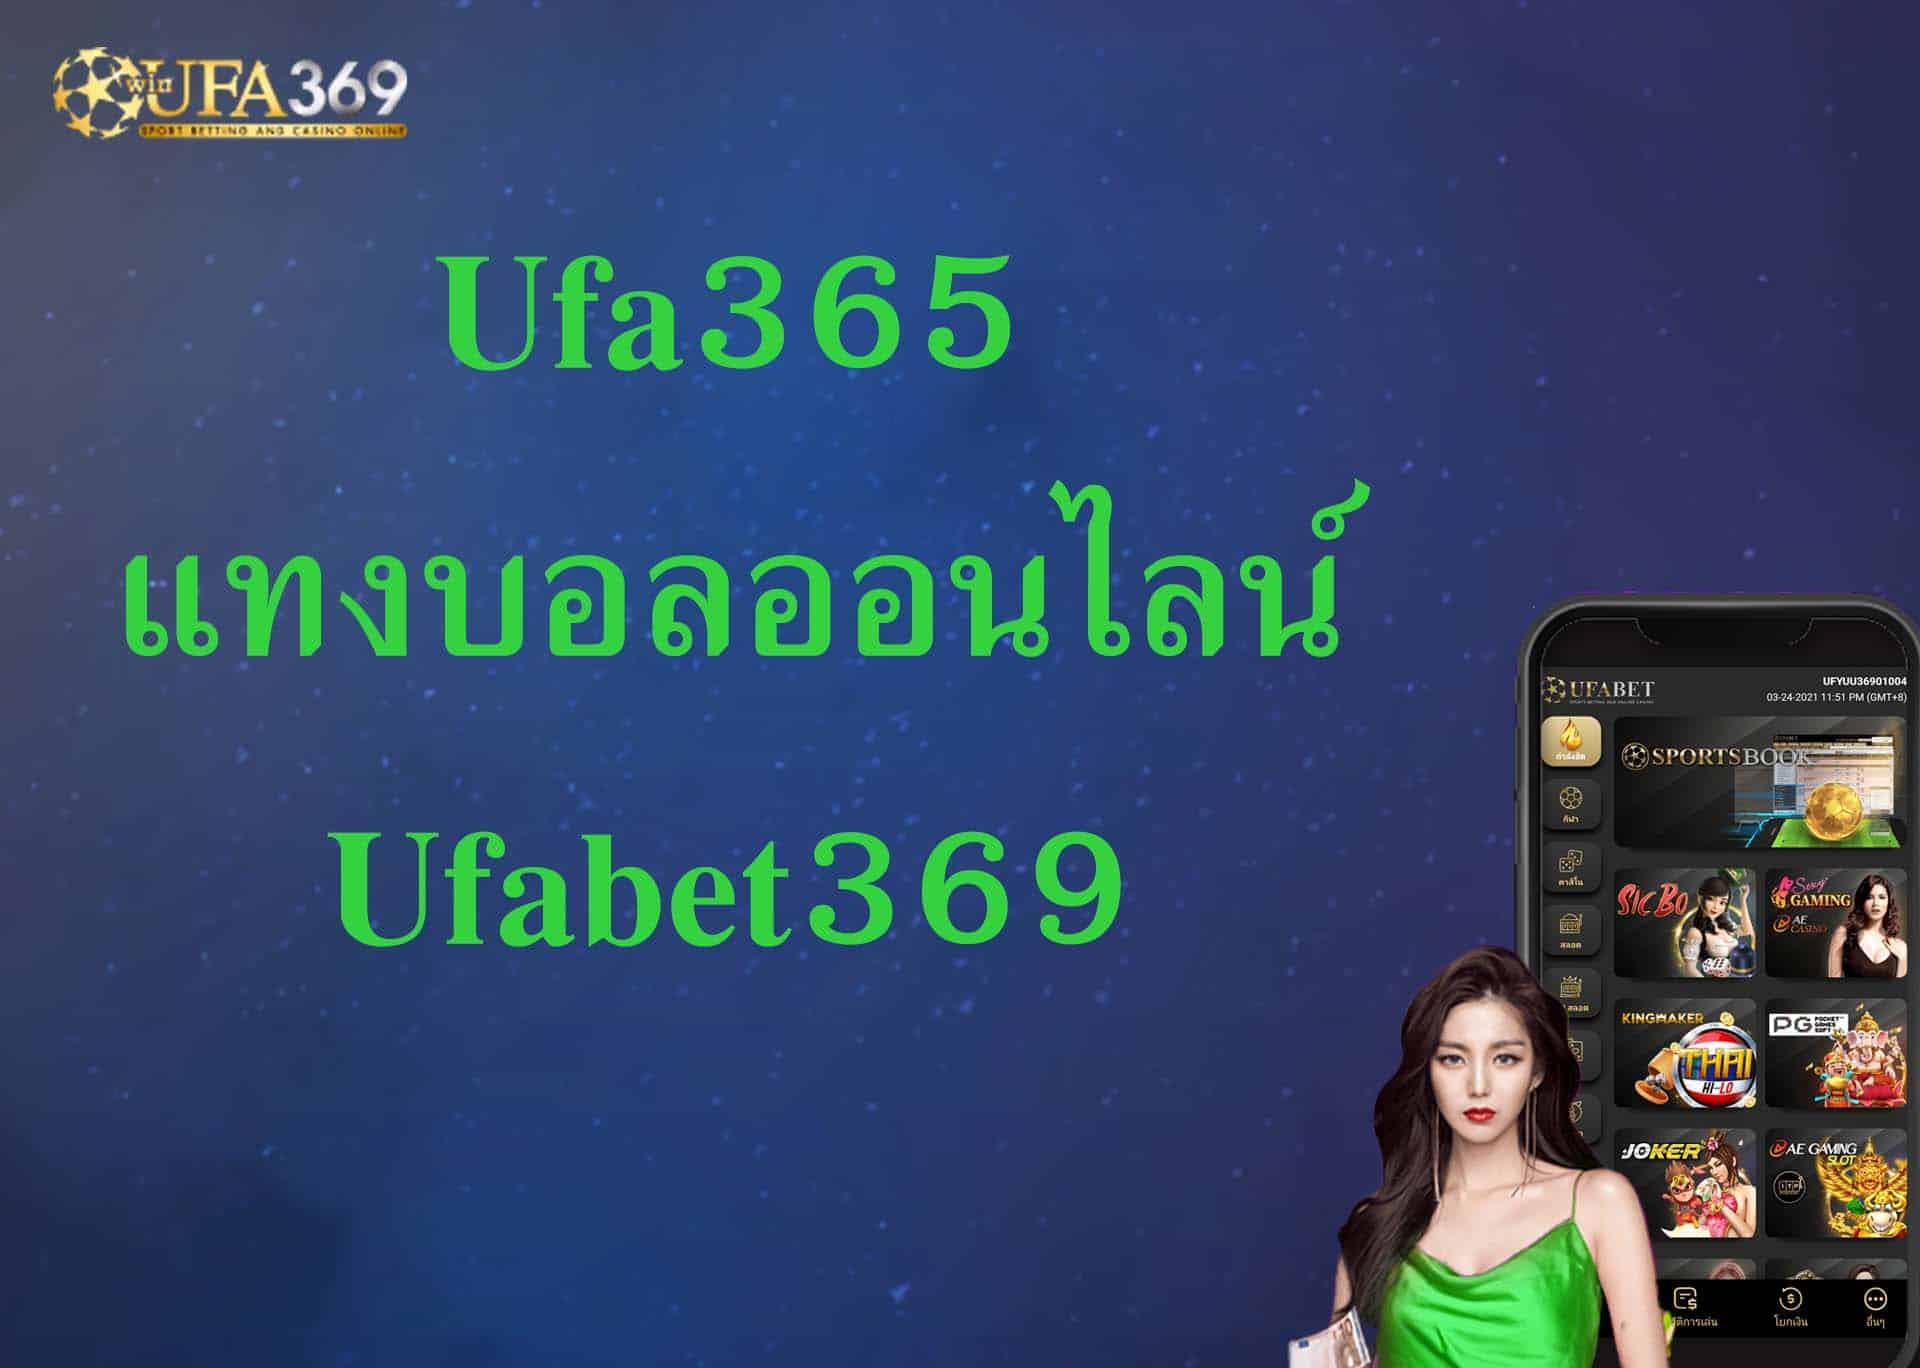 ufa365 แทงบอลออนไลน์ Ufabet369